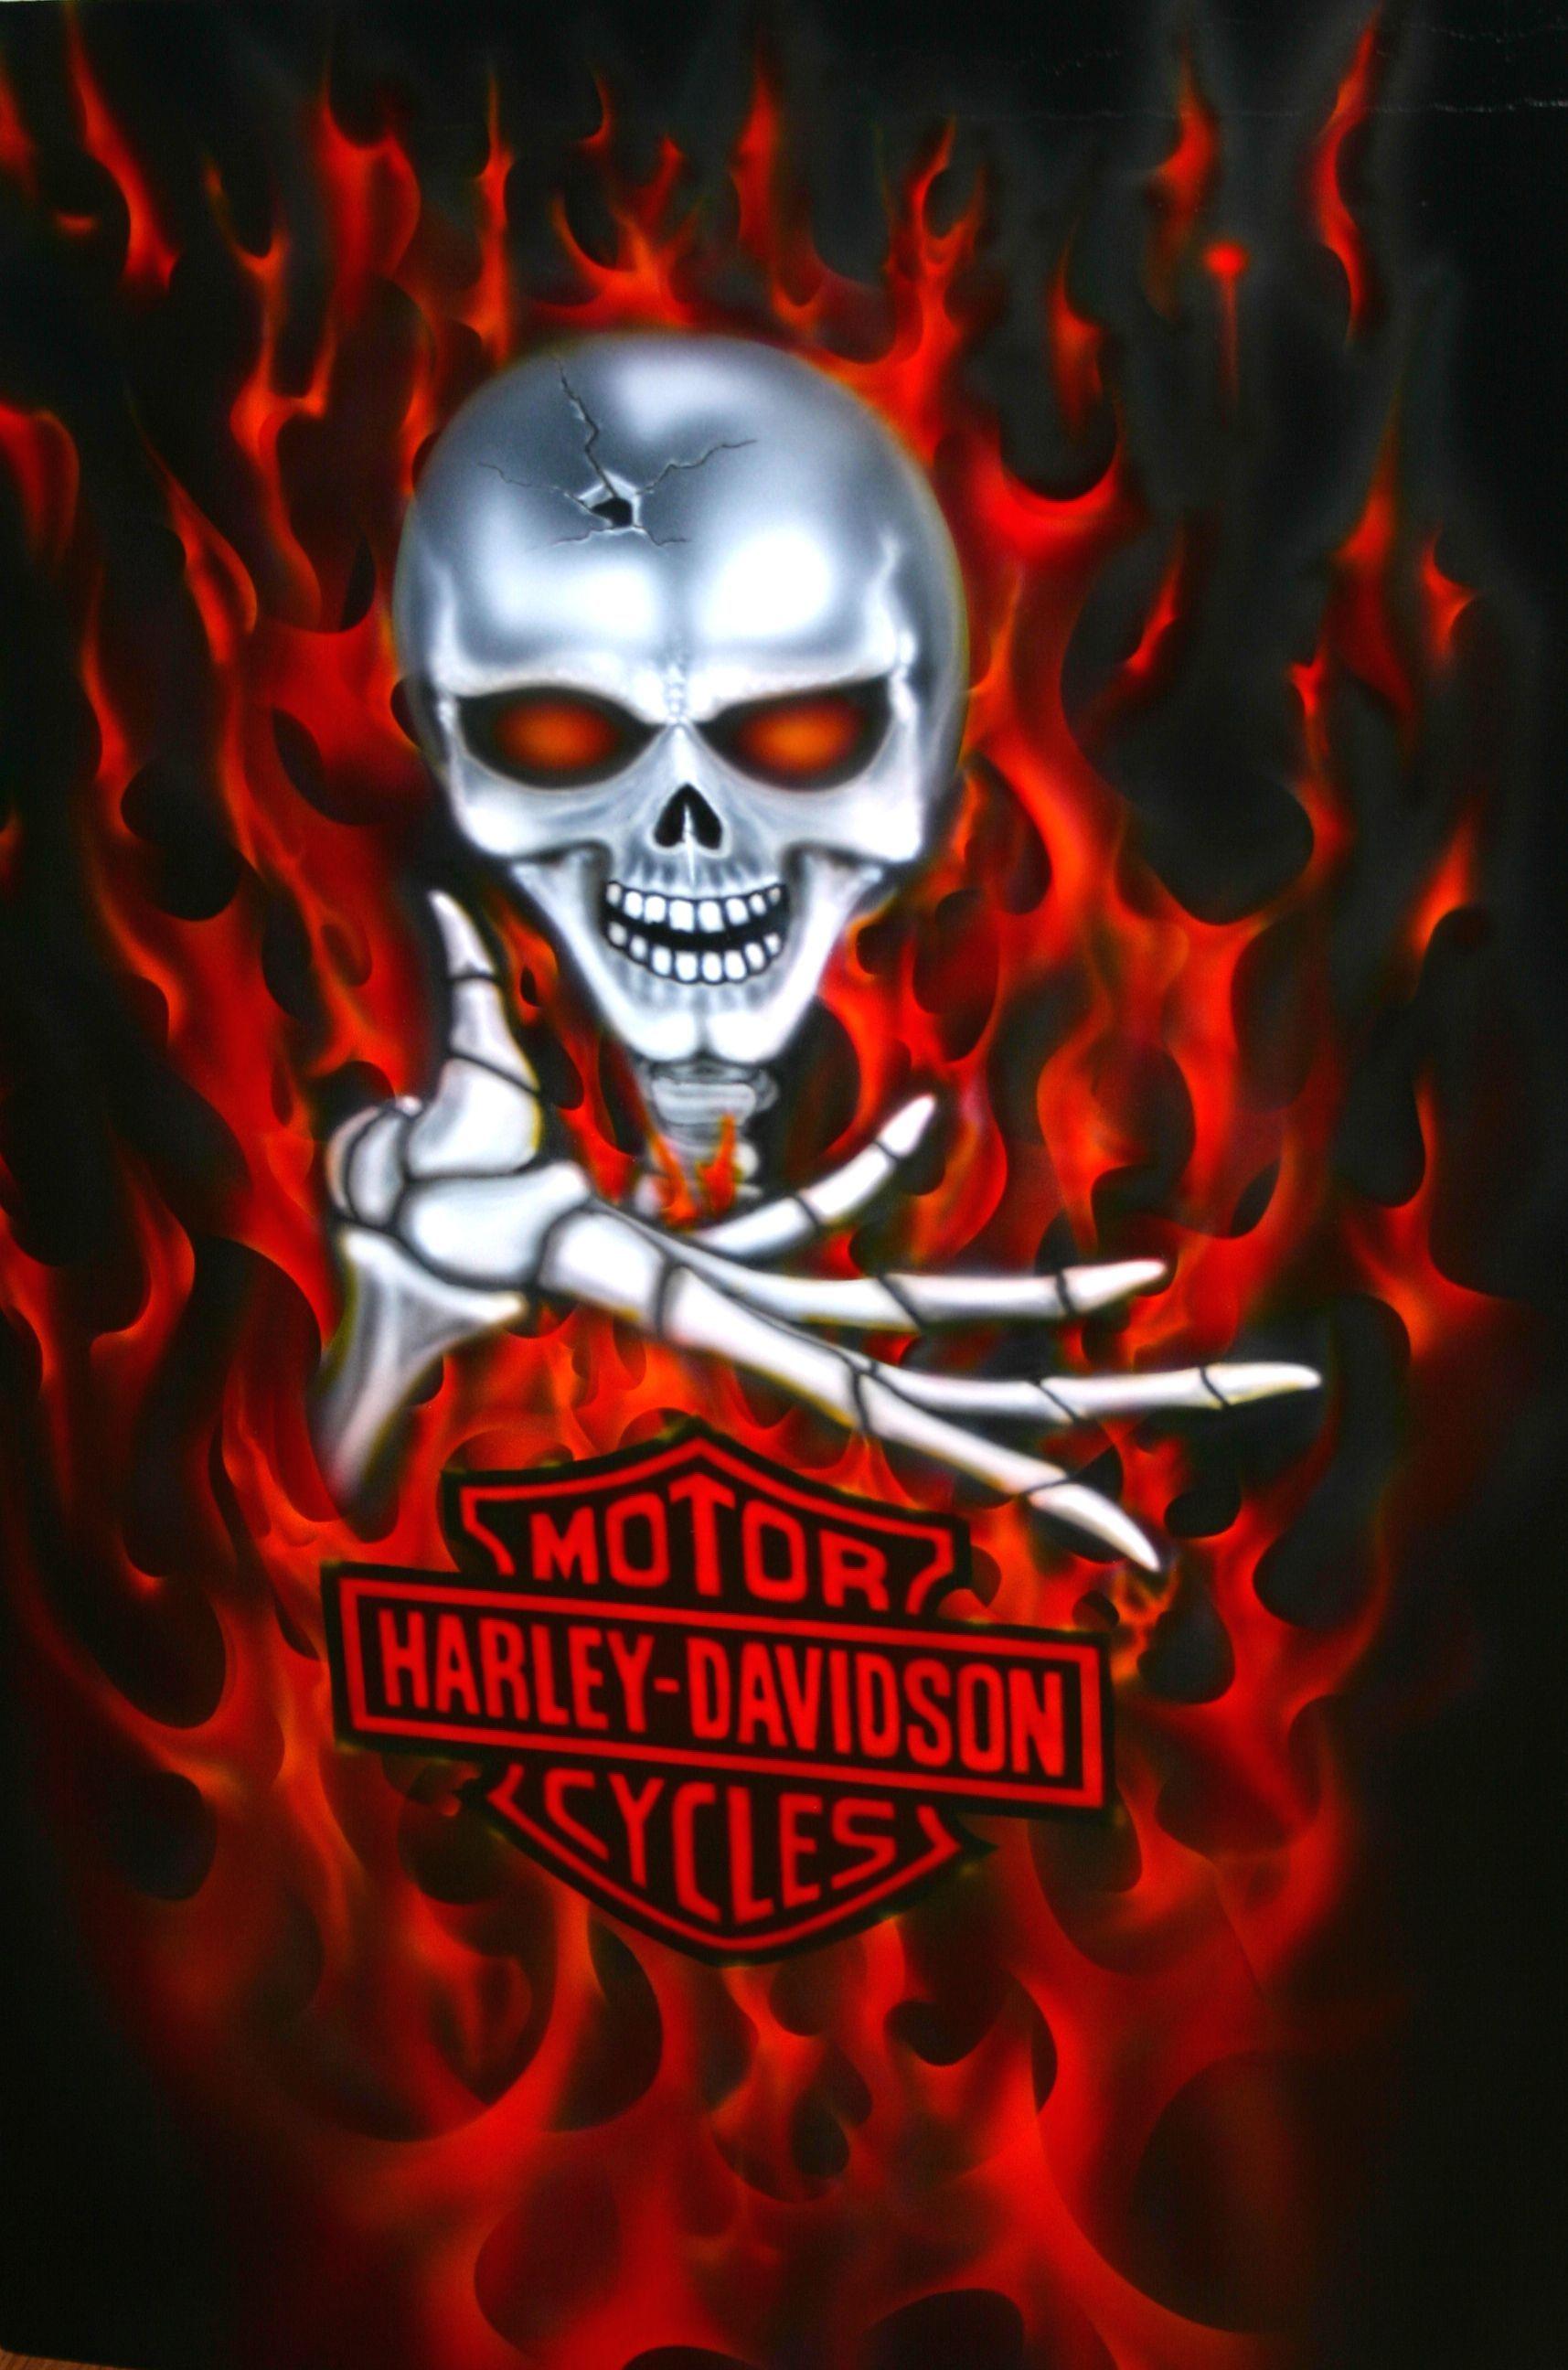 Harley davidson skull logo ripped metal effect on this piece i harley davidson skull logo ripped metal effect on this piece i decided to voltagebd Images